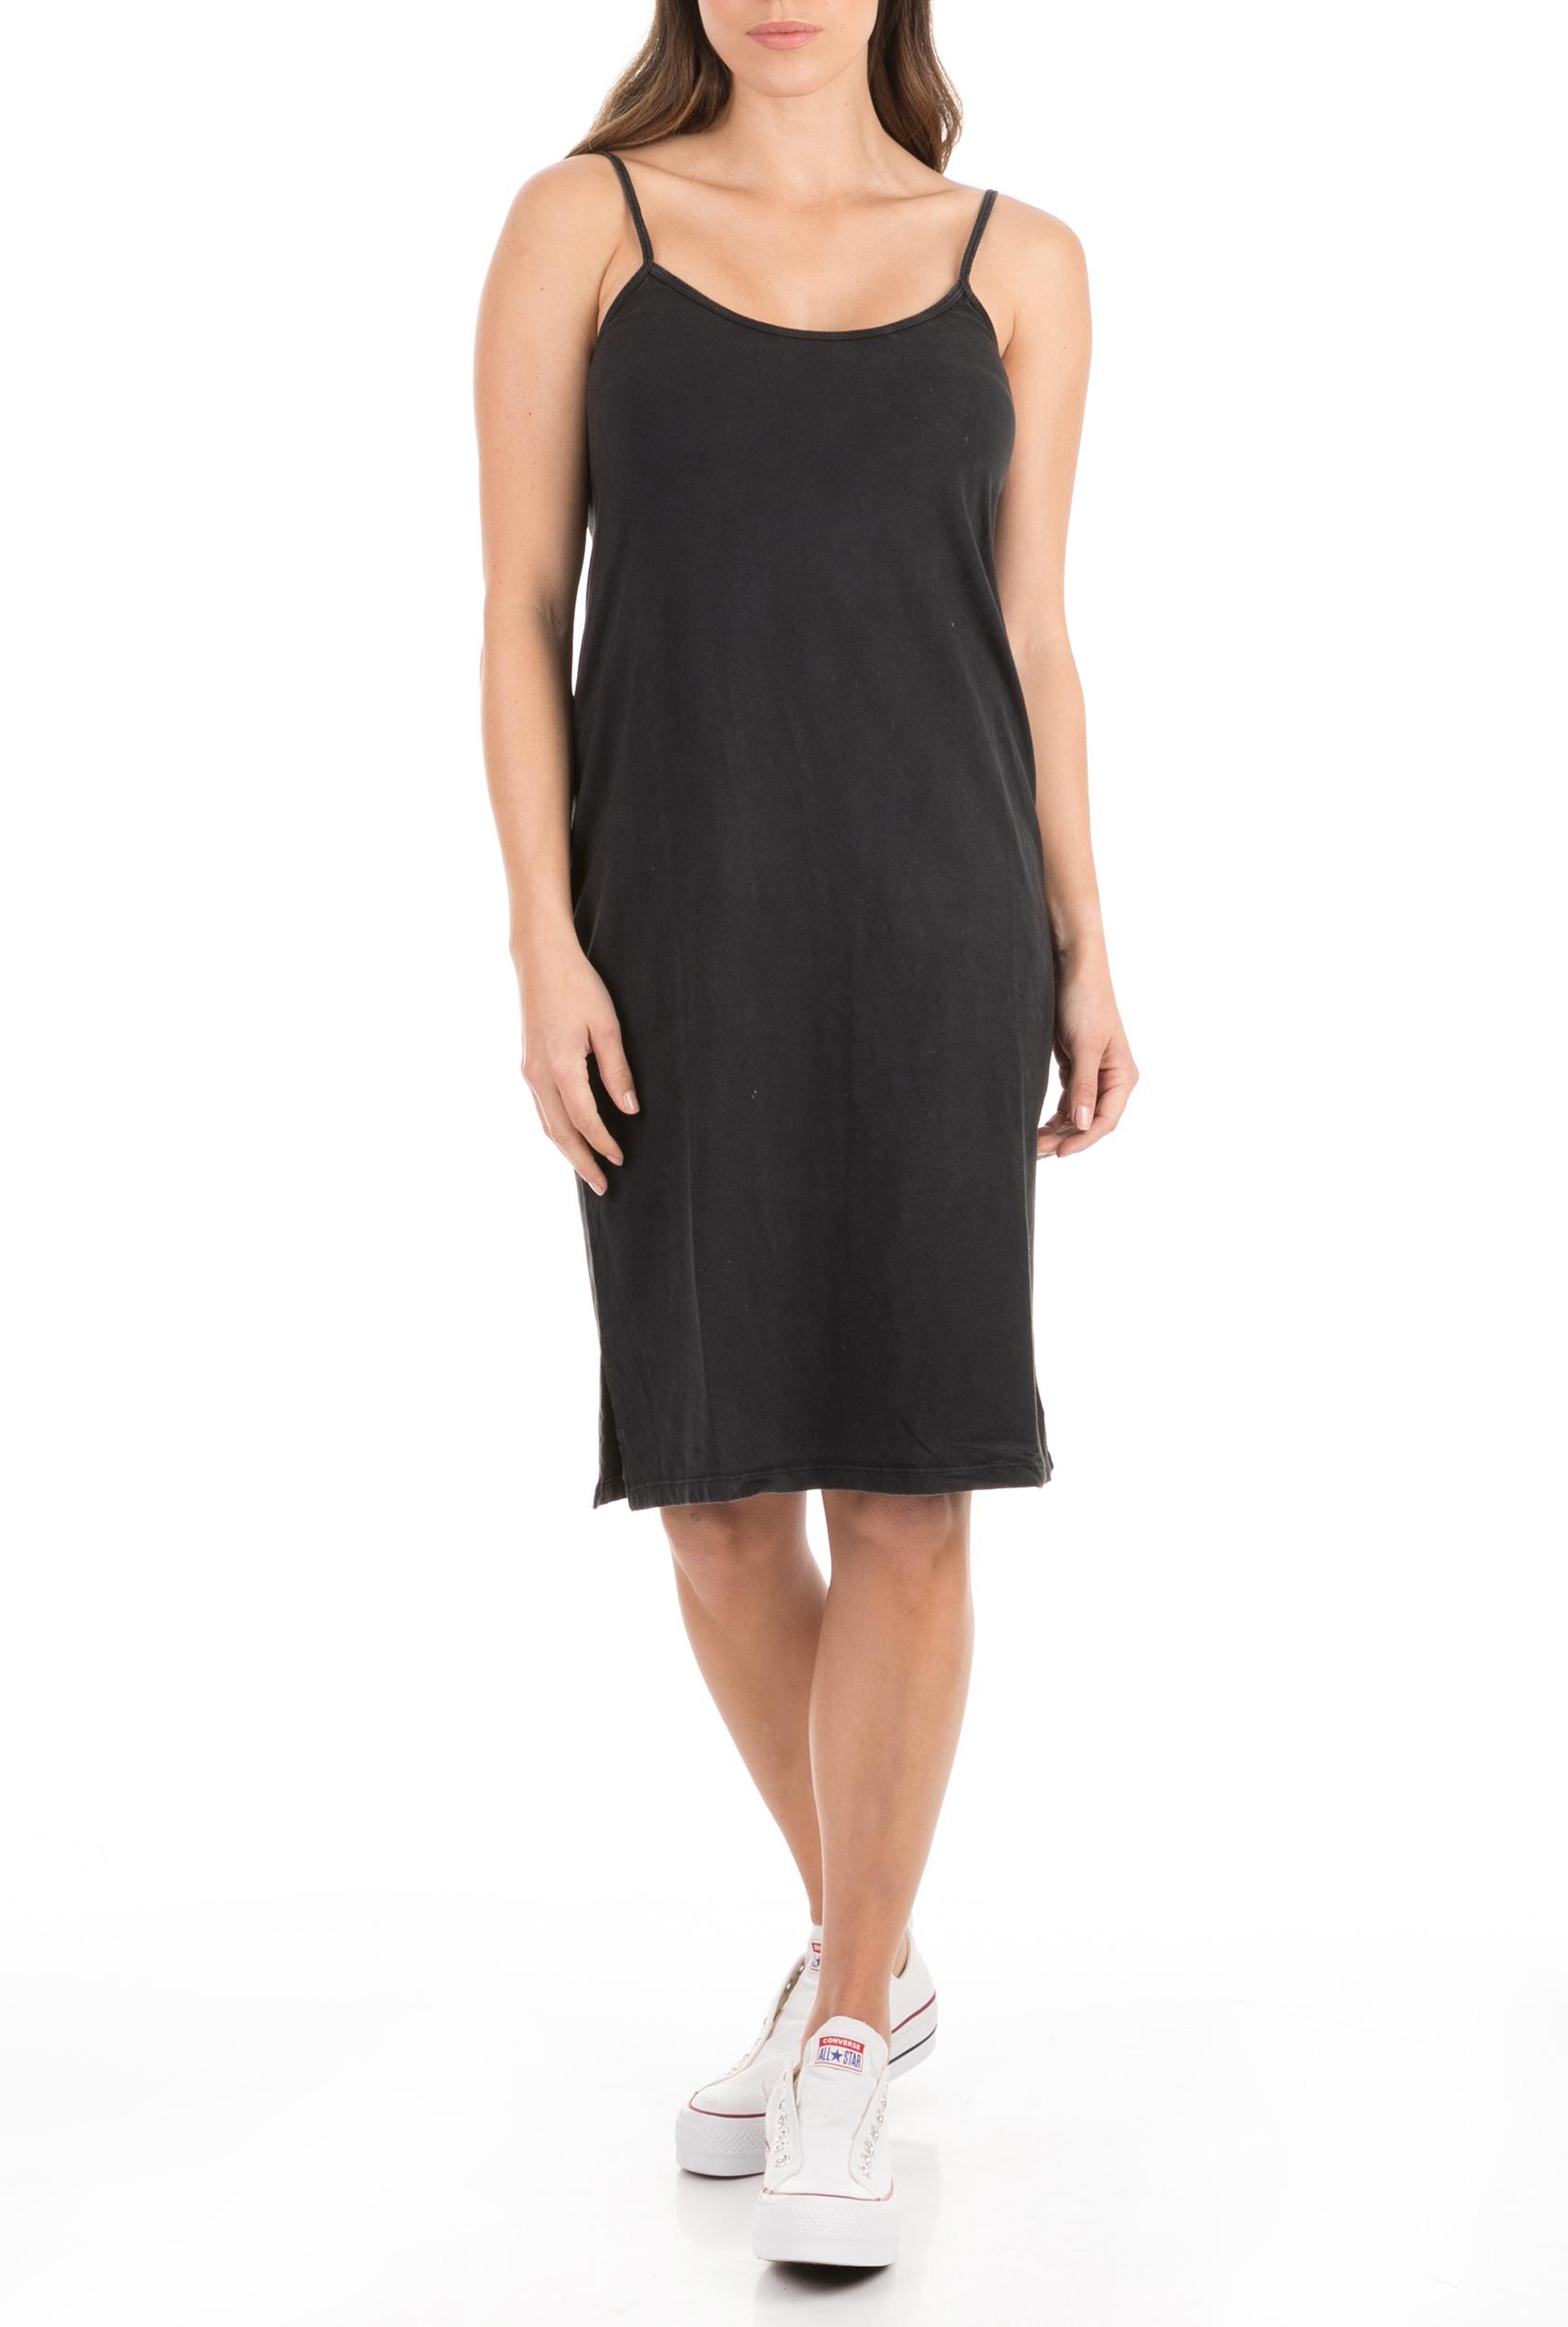 AMERICAN VINTAGE - Γυναικείο midi φόρεμα AMERICAN VINTAGE μαύρο